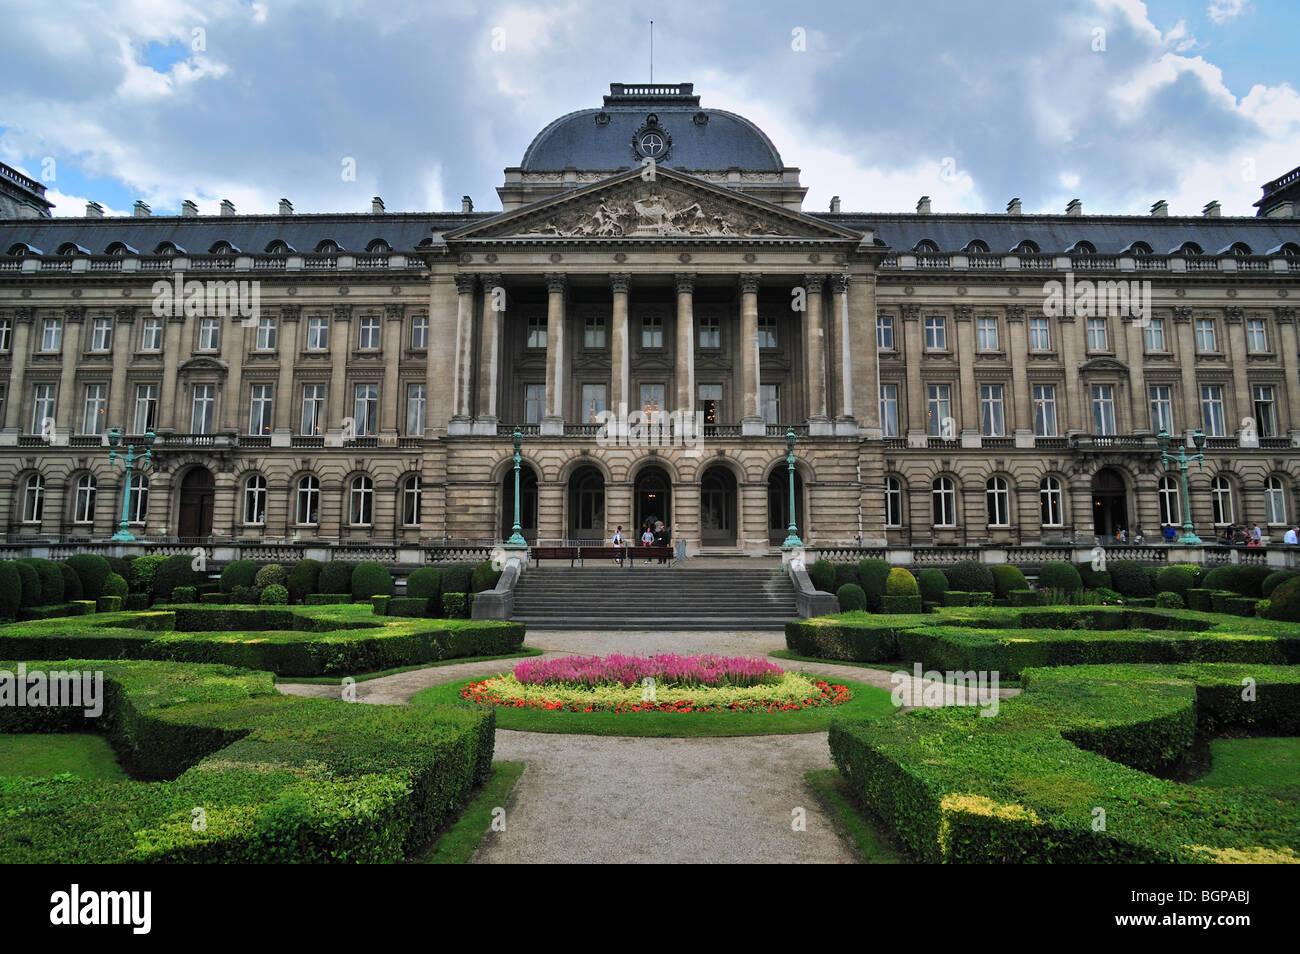 The royal palace of brussels palais royal de bruxelles koninklijk stock photo royalty free - Salon de the palais royal ...